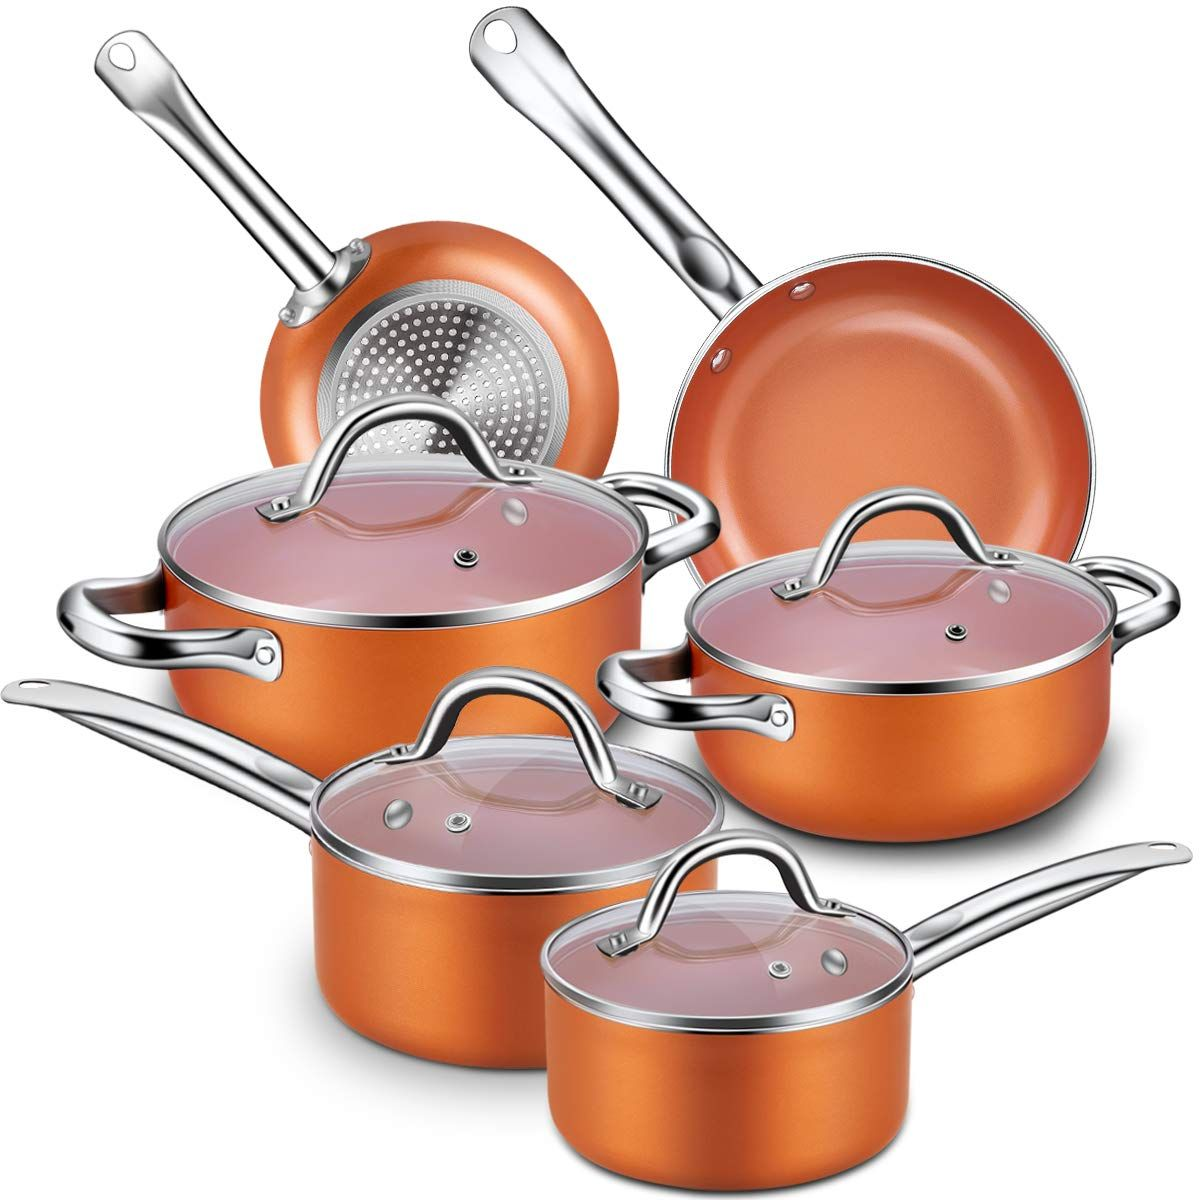 Nonstick Cookware Set Pots And Pans Sets Cookware Set Nonstick Cookware